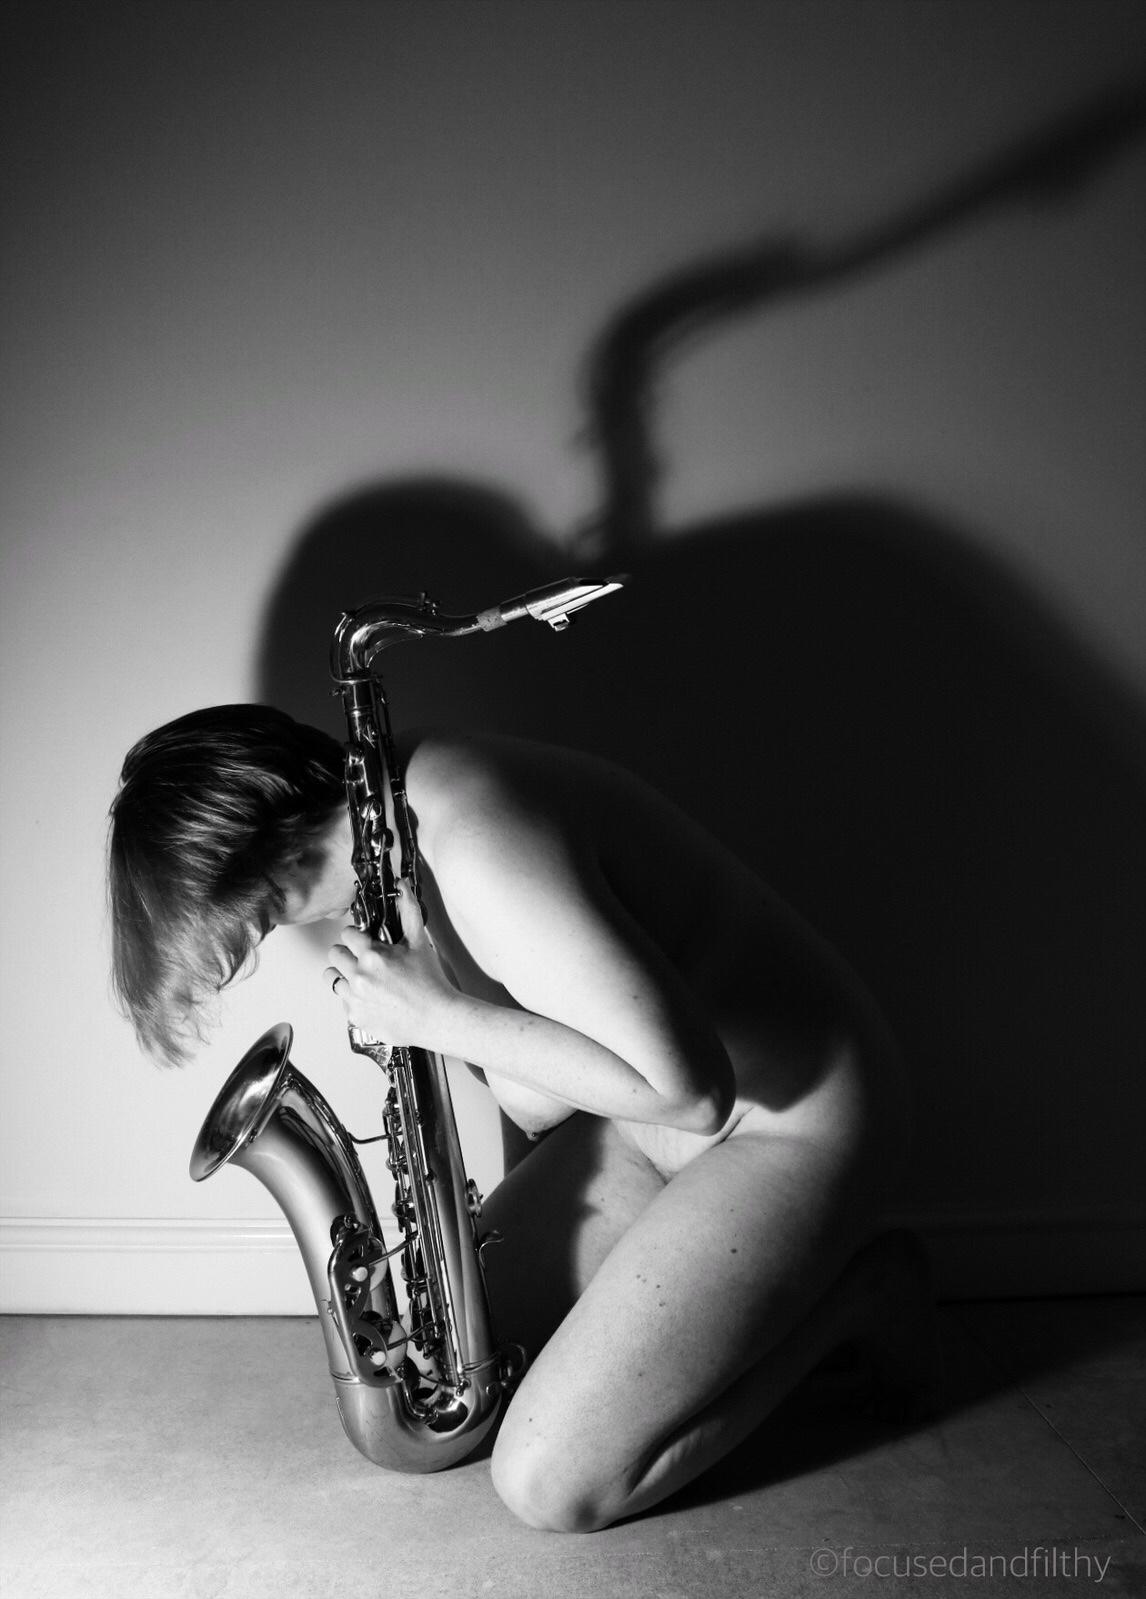 Sax in the Shadows